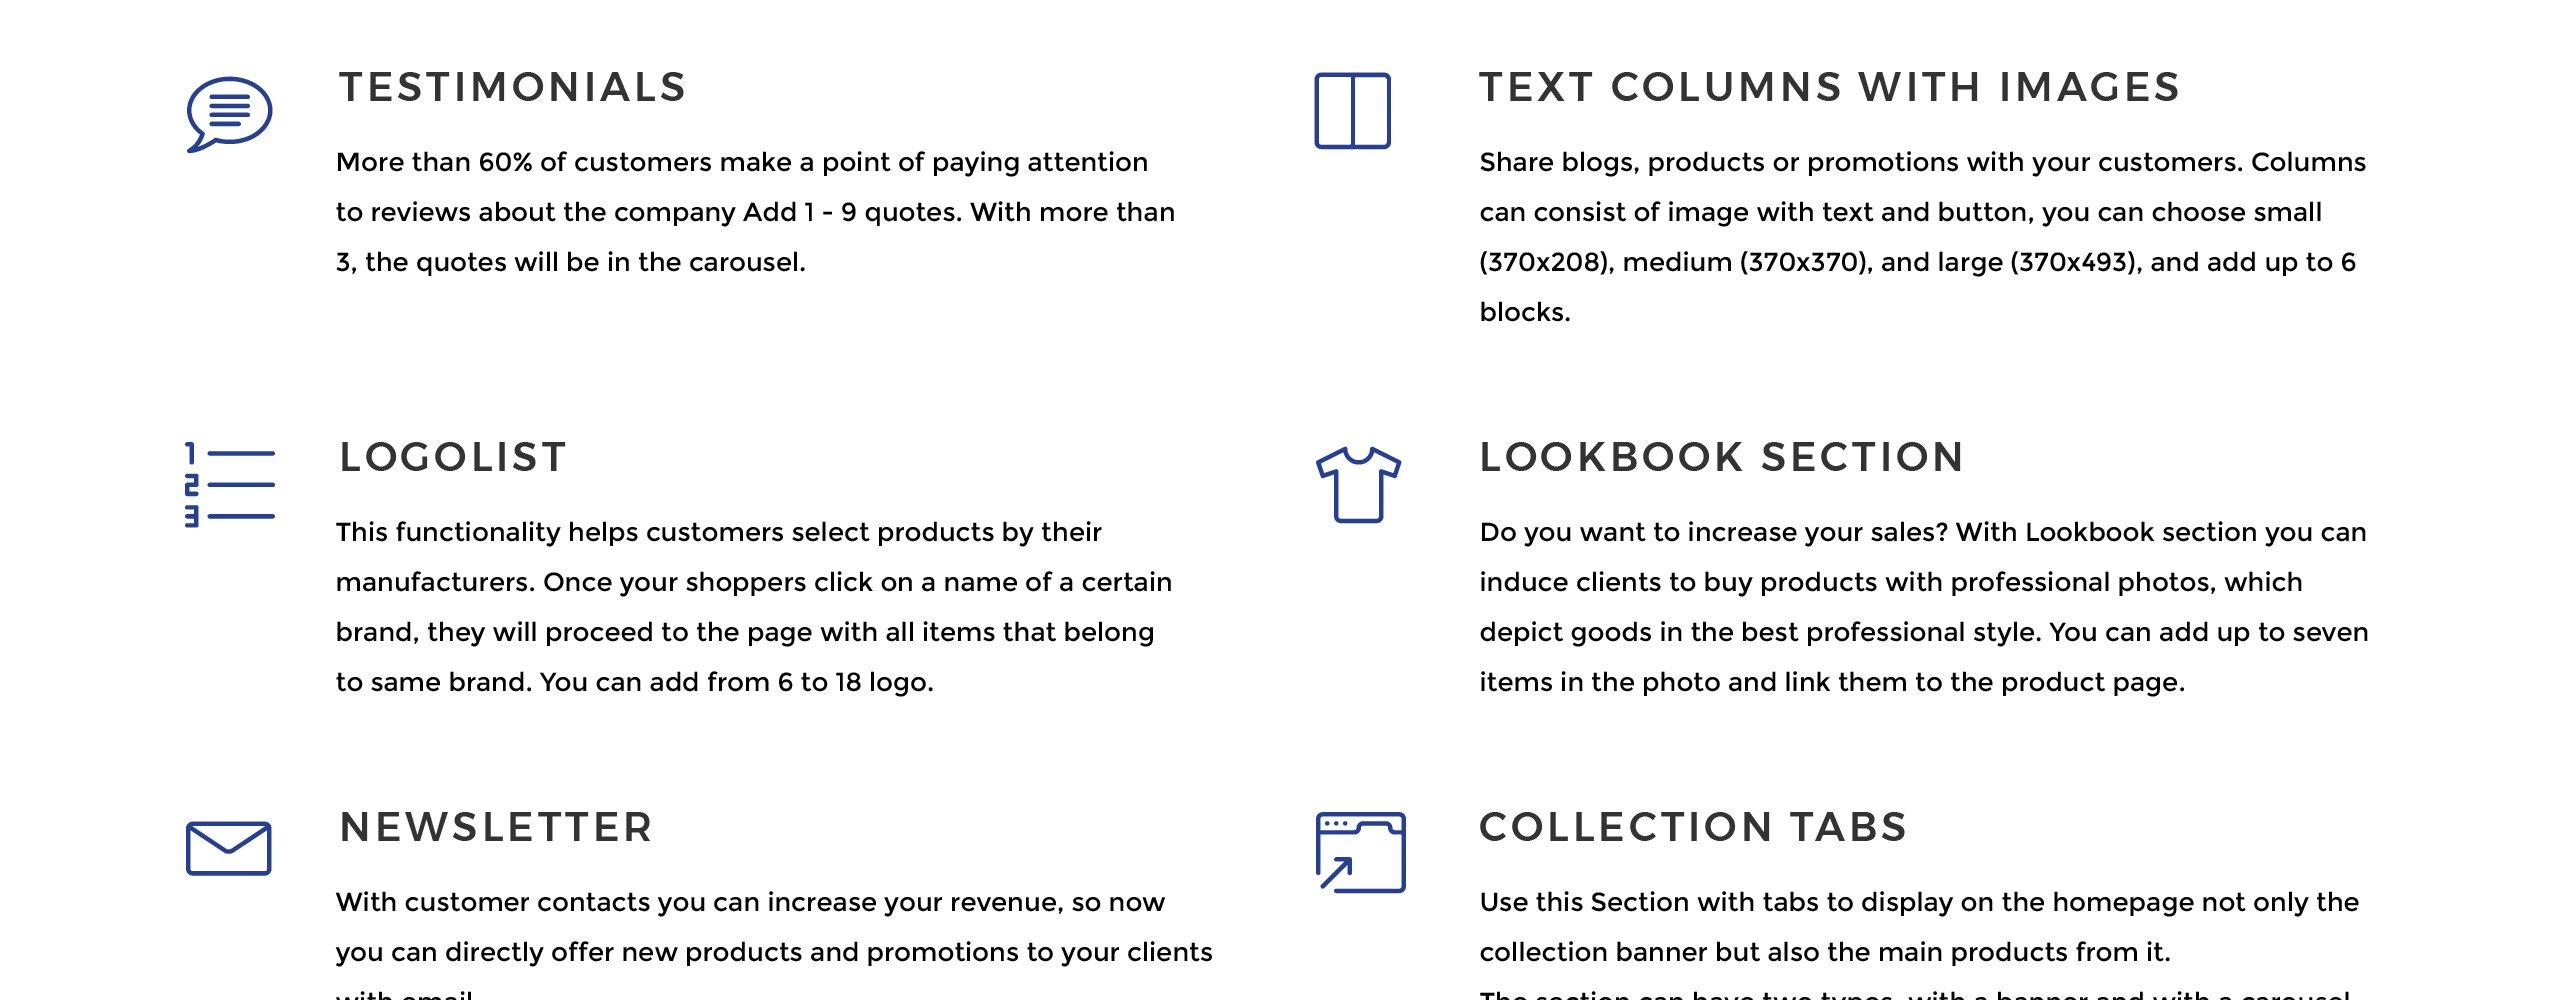 Website Design Template 73470 - ecommerce shop shopify tires wheelsundefined